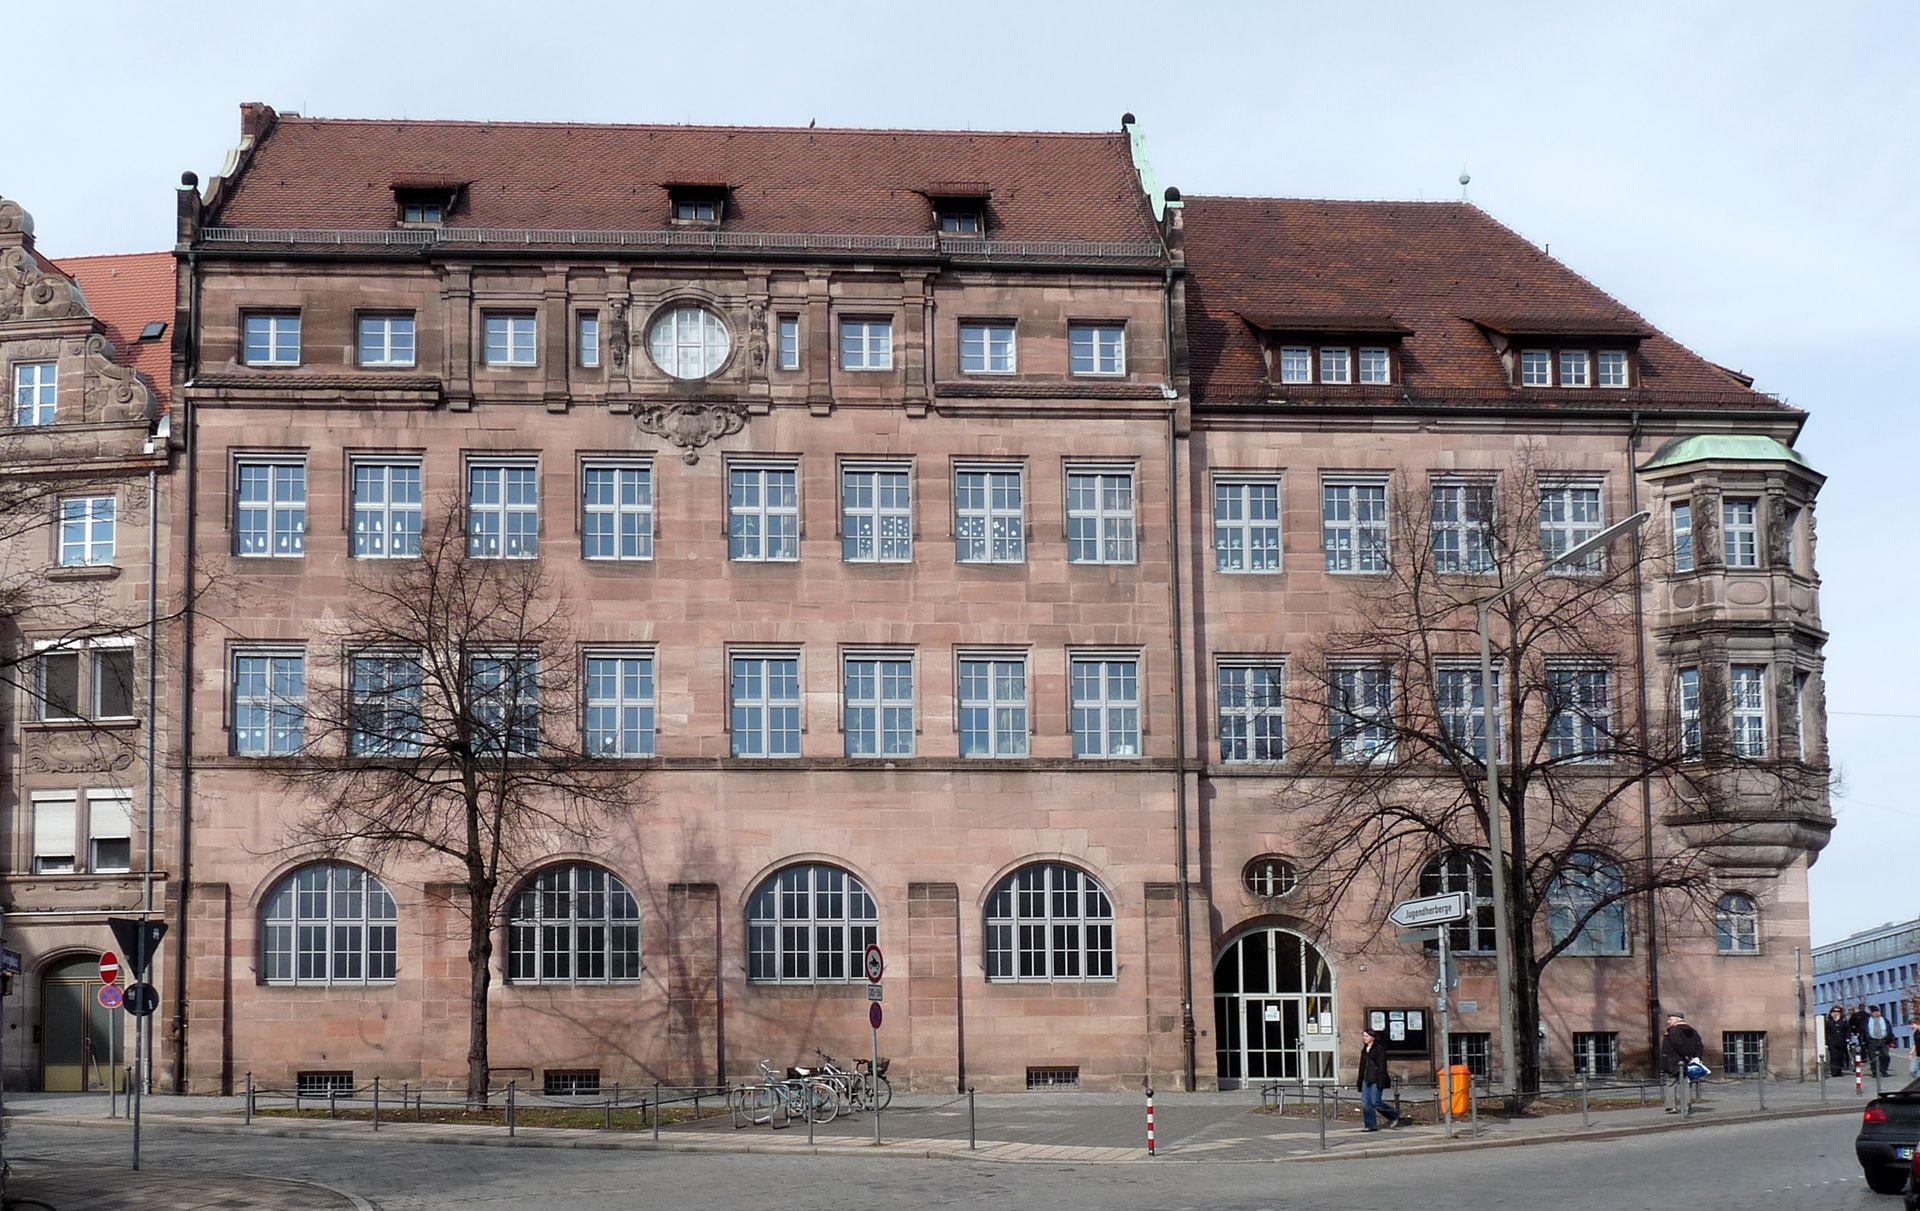 Primary School, Paniersplatz School house(front roof lantern, lost in the war)